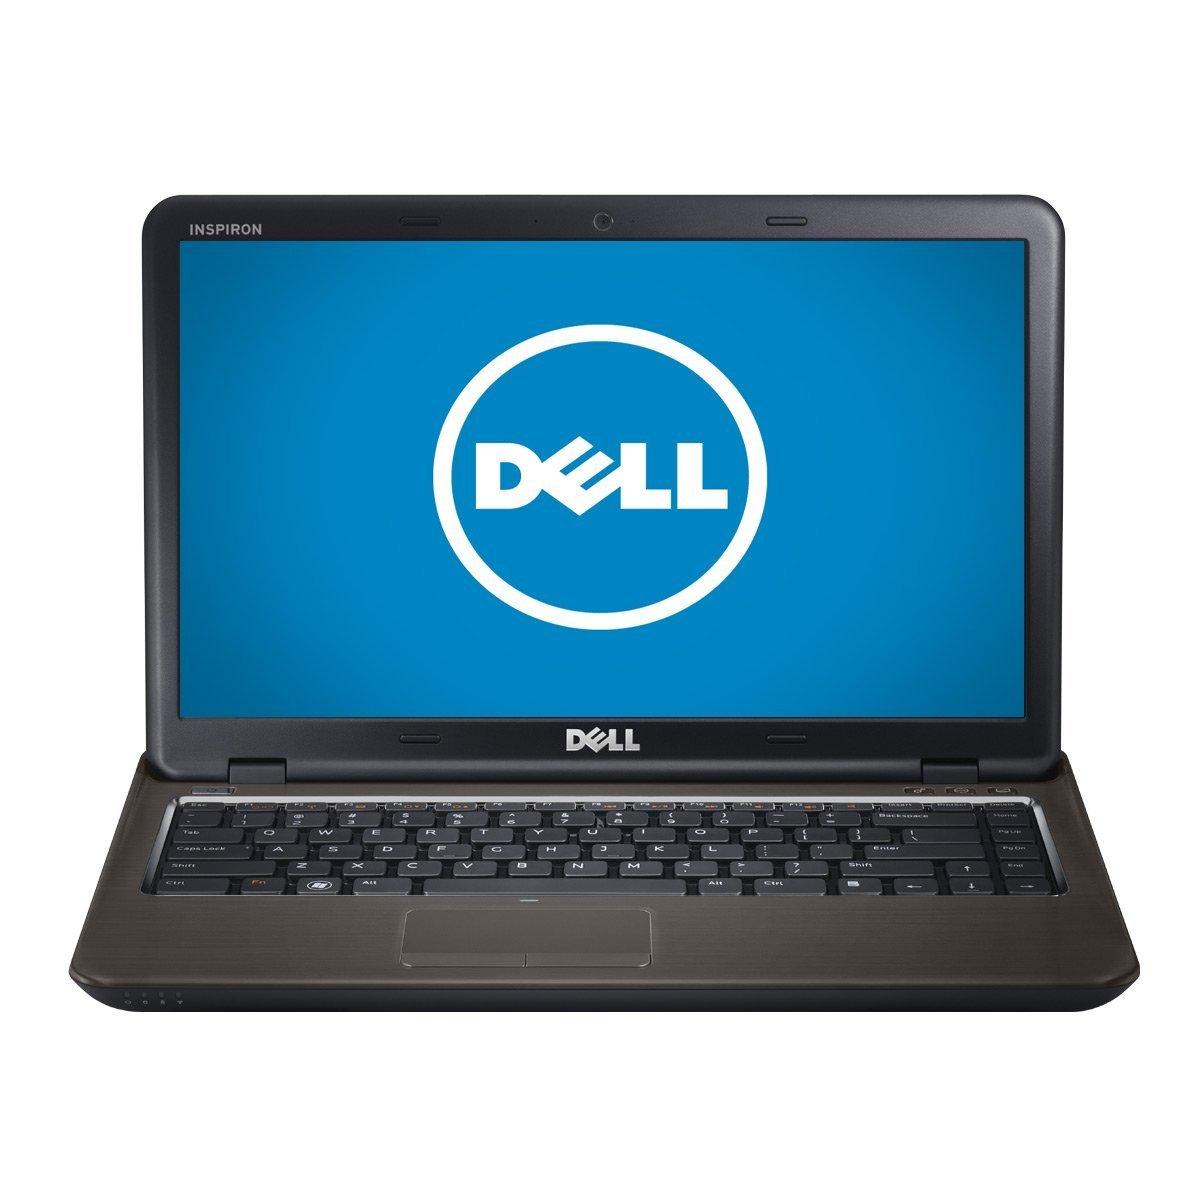 https://thetechjournal.com/wp-content/uploads/images/1204/1333304418-dell-inspiron-i14z2877bk-14inch-laptop-3.jpg